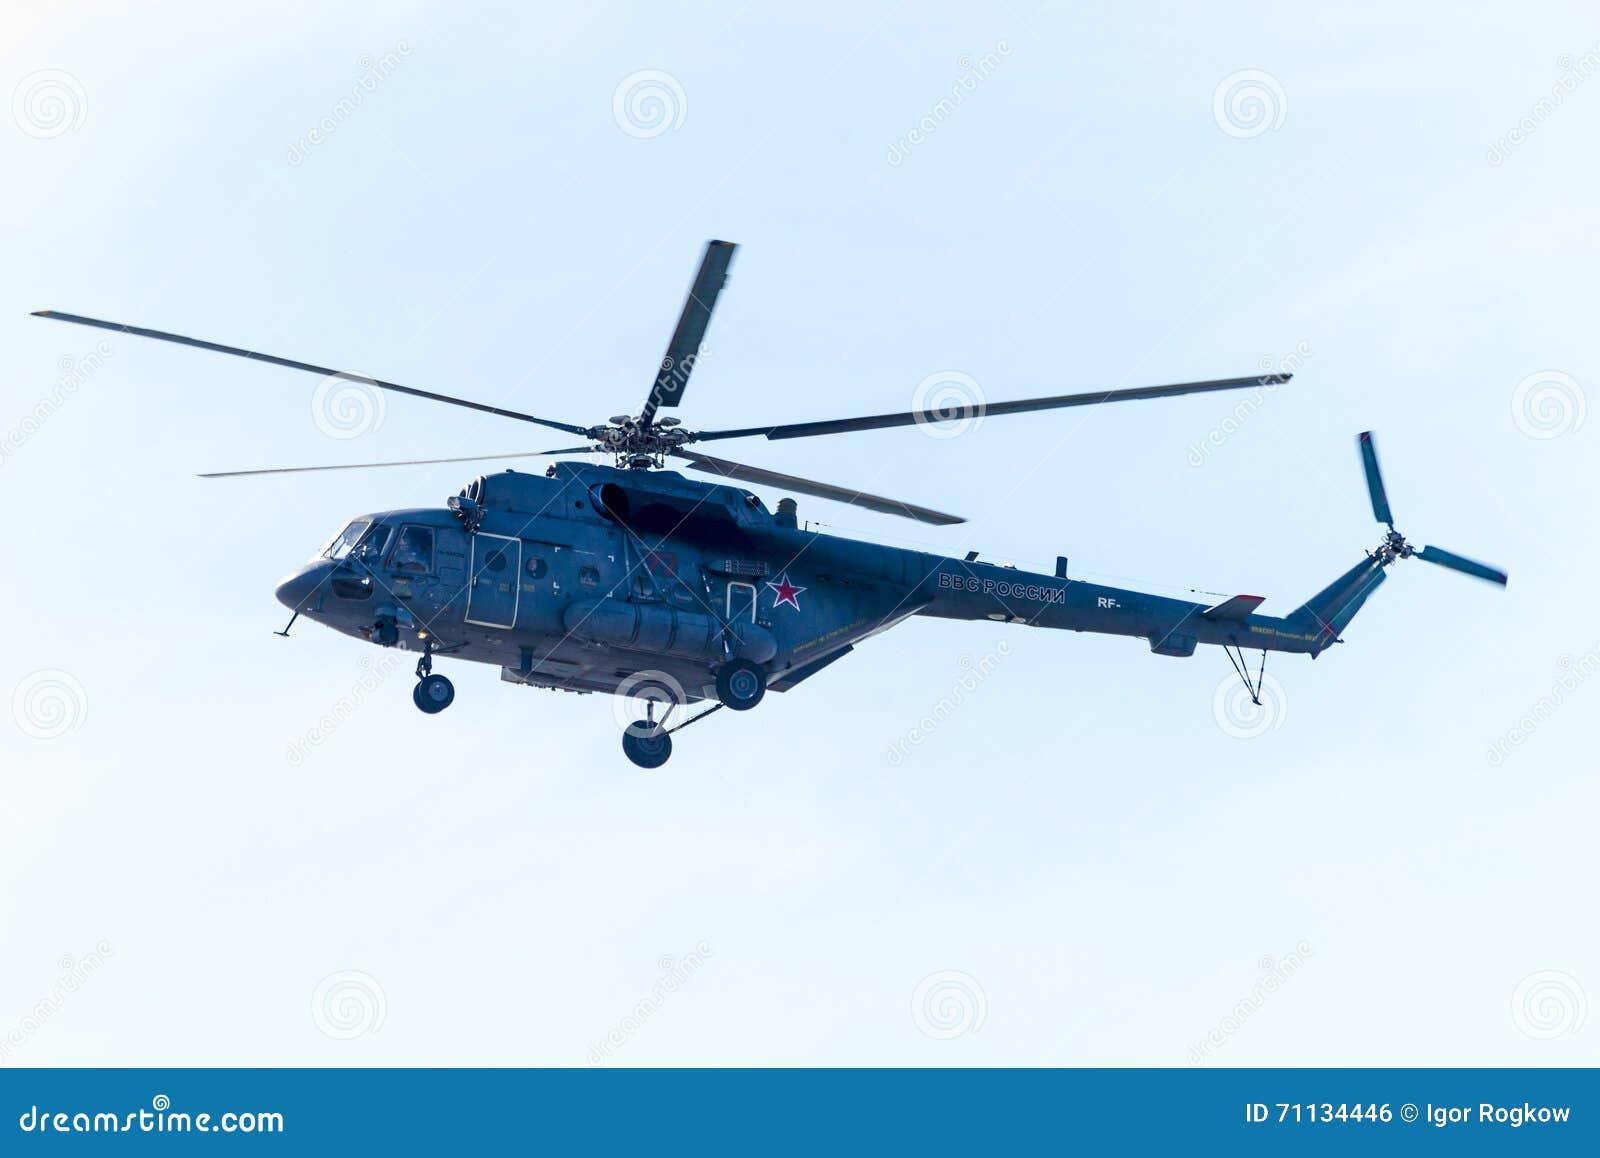 Elicottero 8 : Elipama elicottero radiocomandato silver shadow ghz